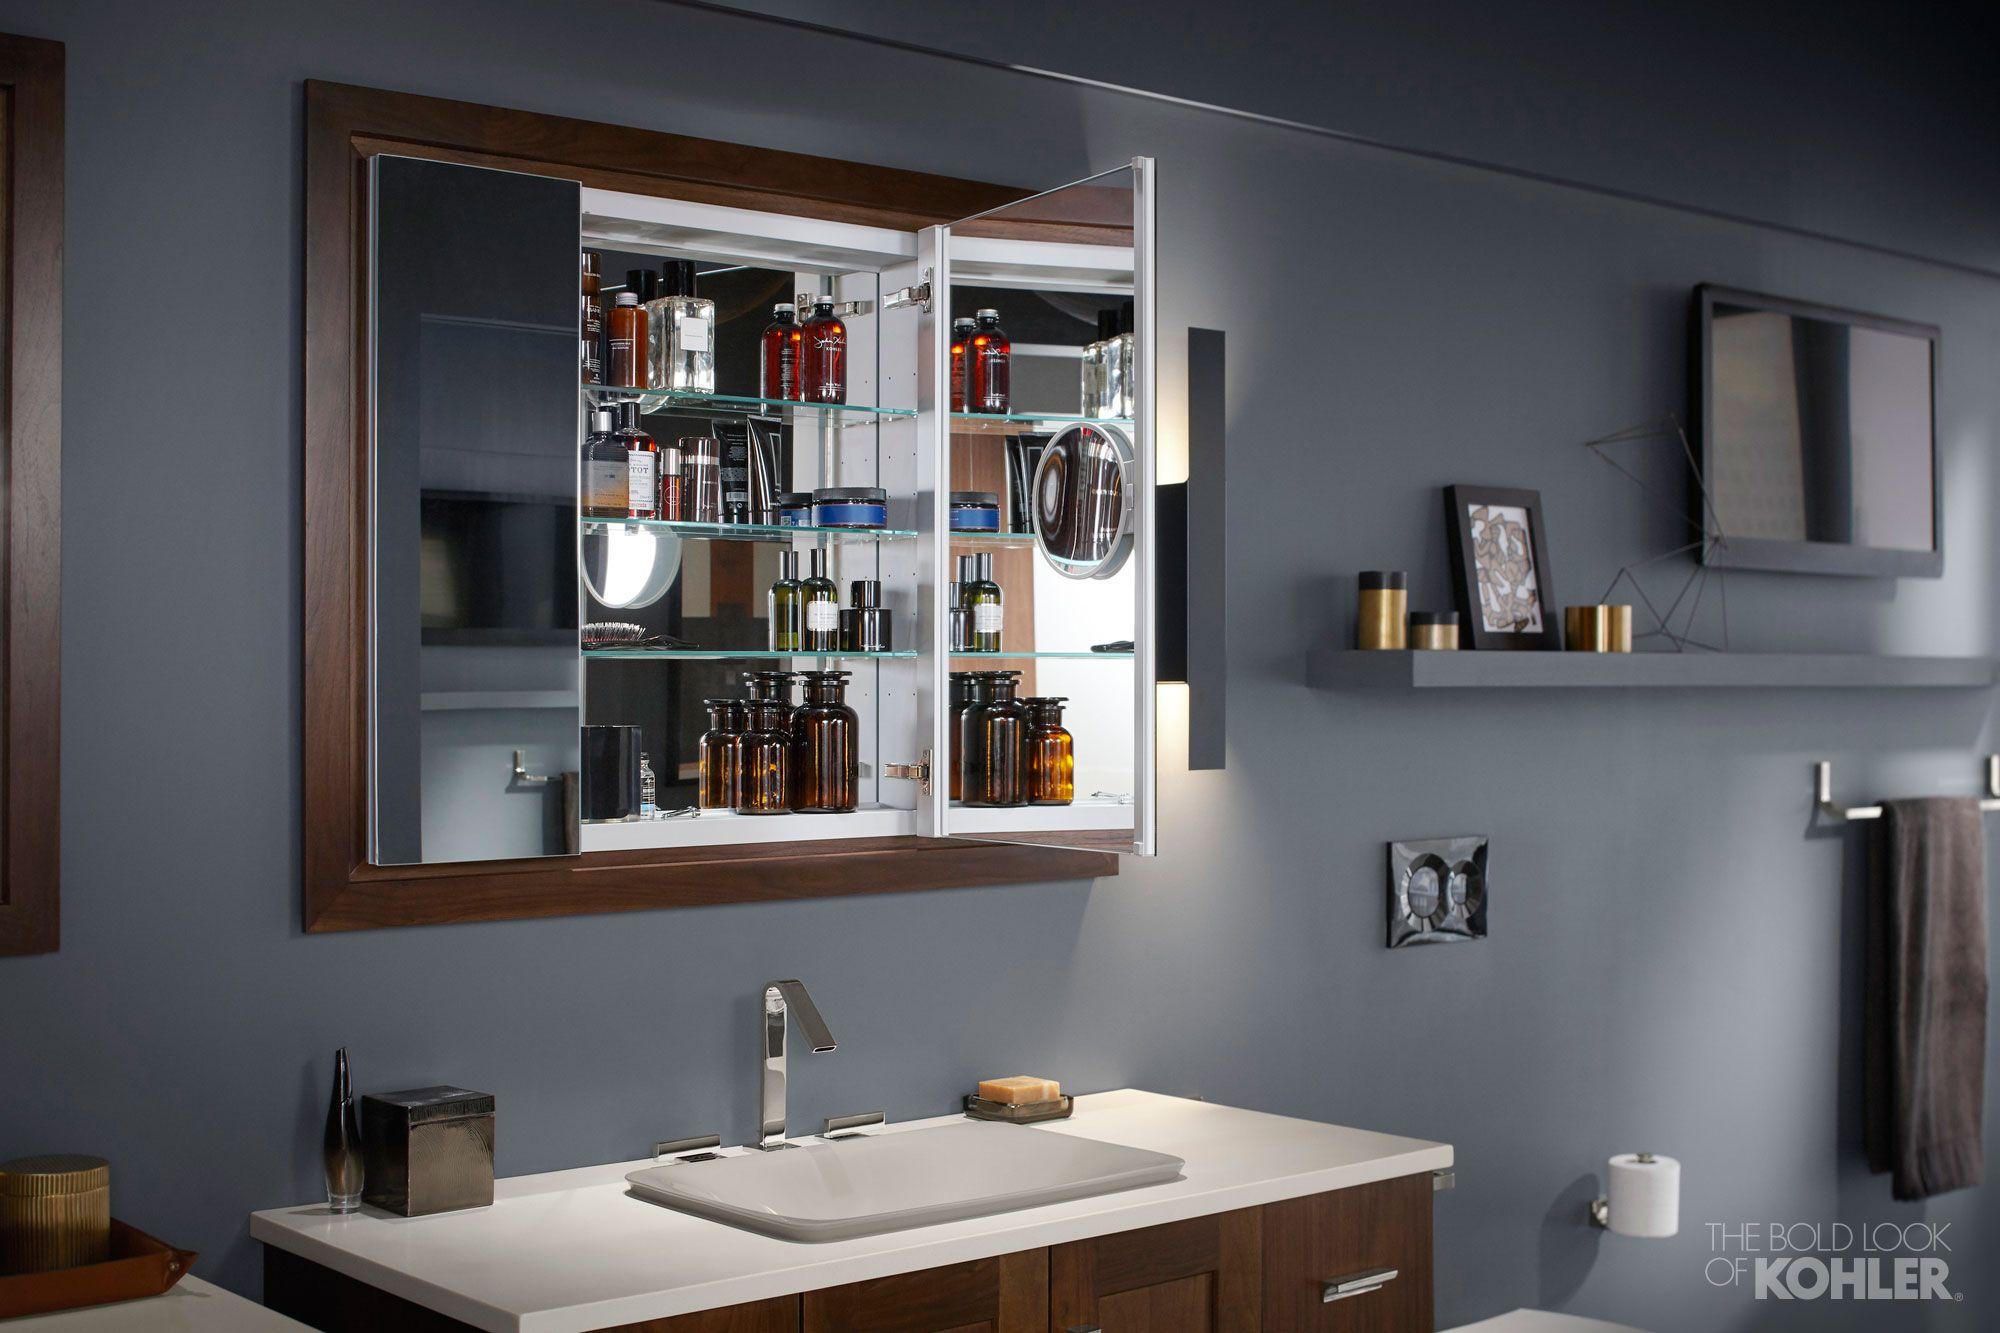 Minimalism Unveiled Bathroom Kohler Ideas Bathroom Design Medicine Cabinet Mirror Bathrooms Remodel [ 1333 x 2000 Pixel ]